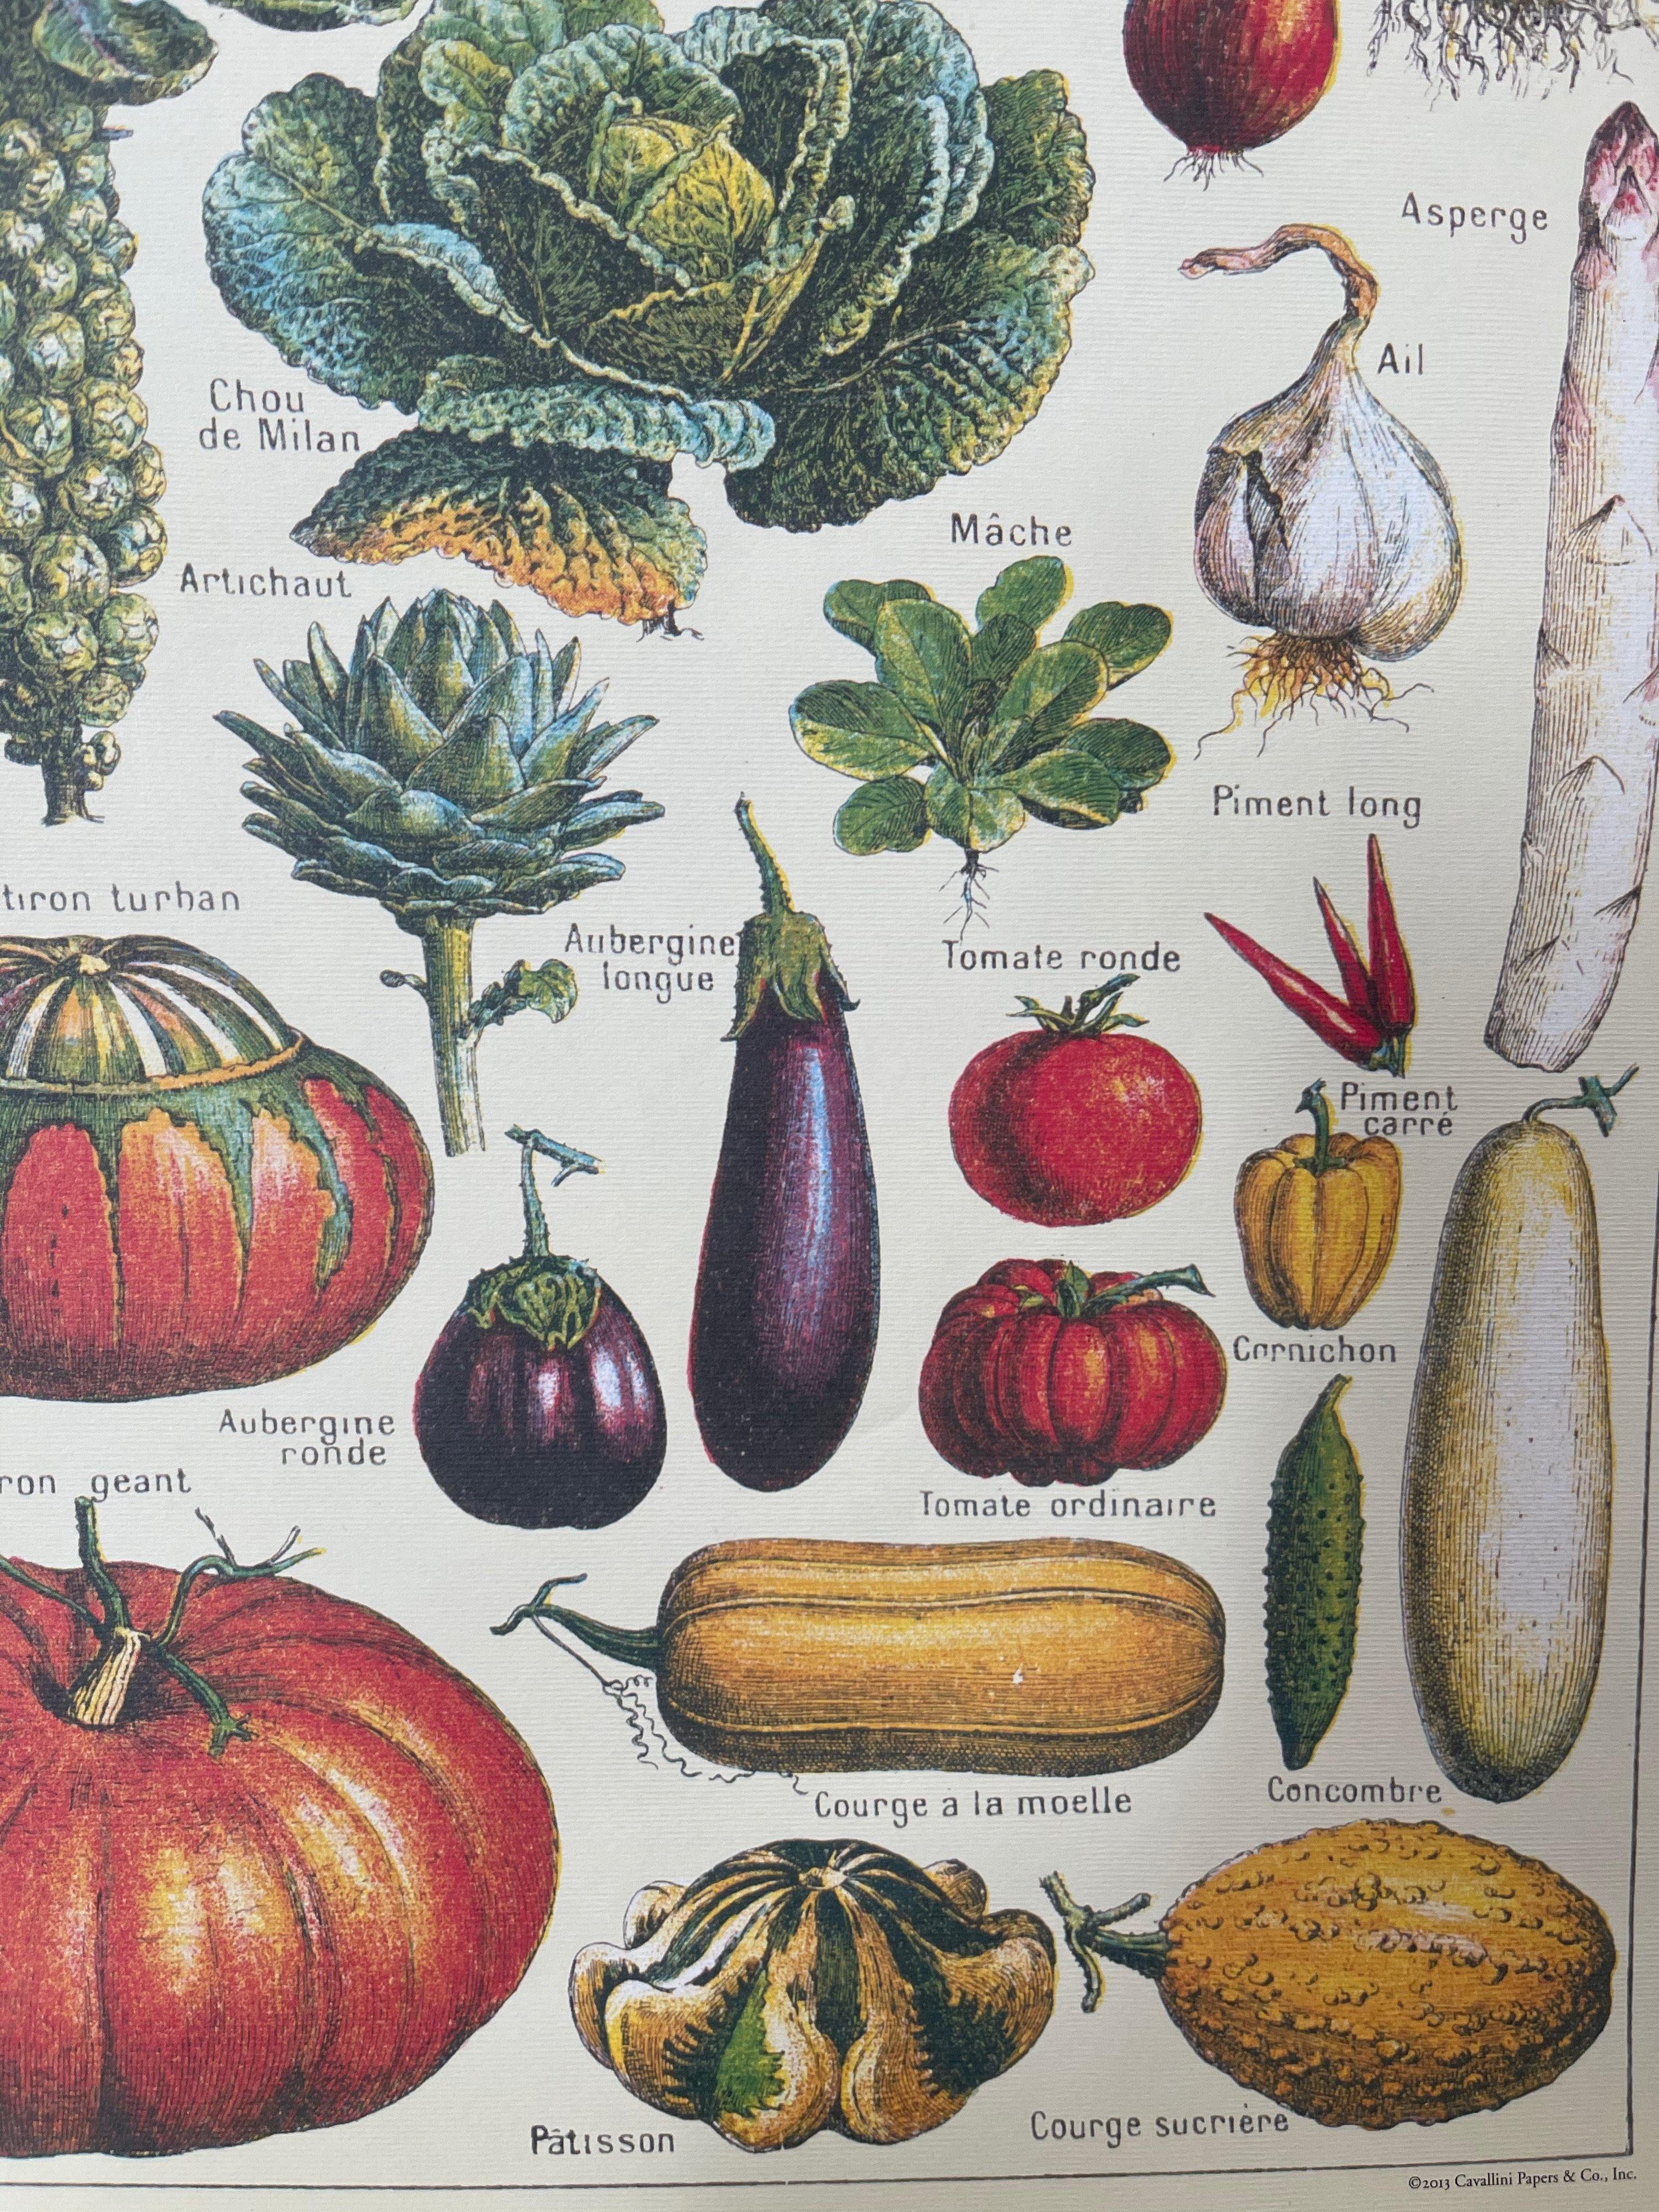 Le Jardin - French Vegetable Garden Poster